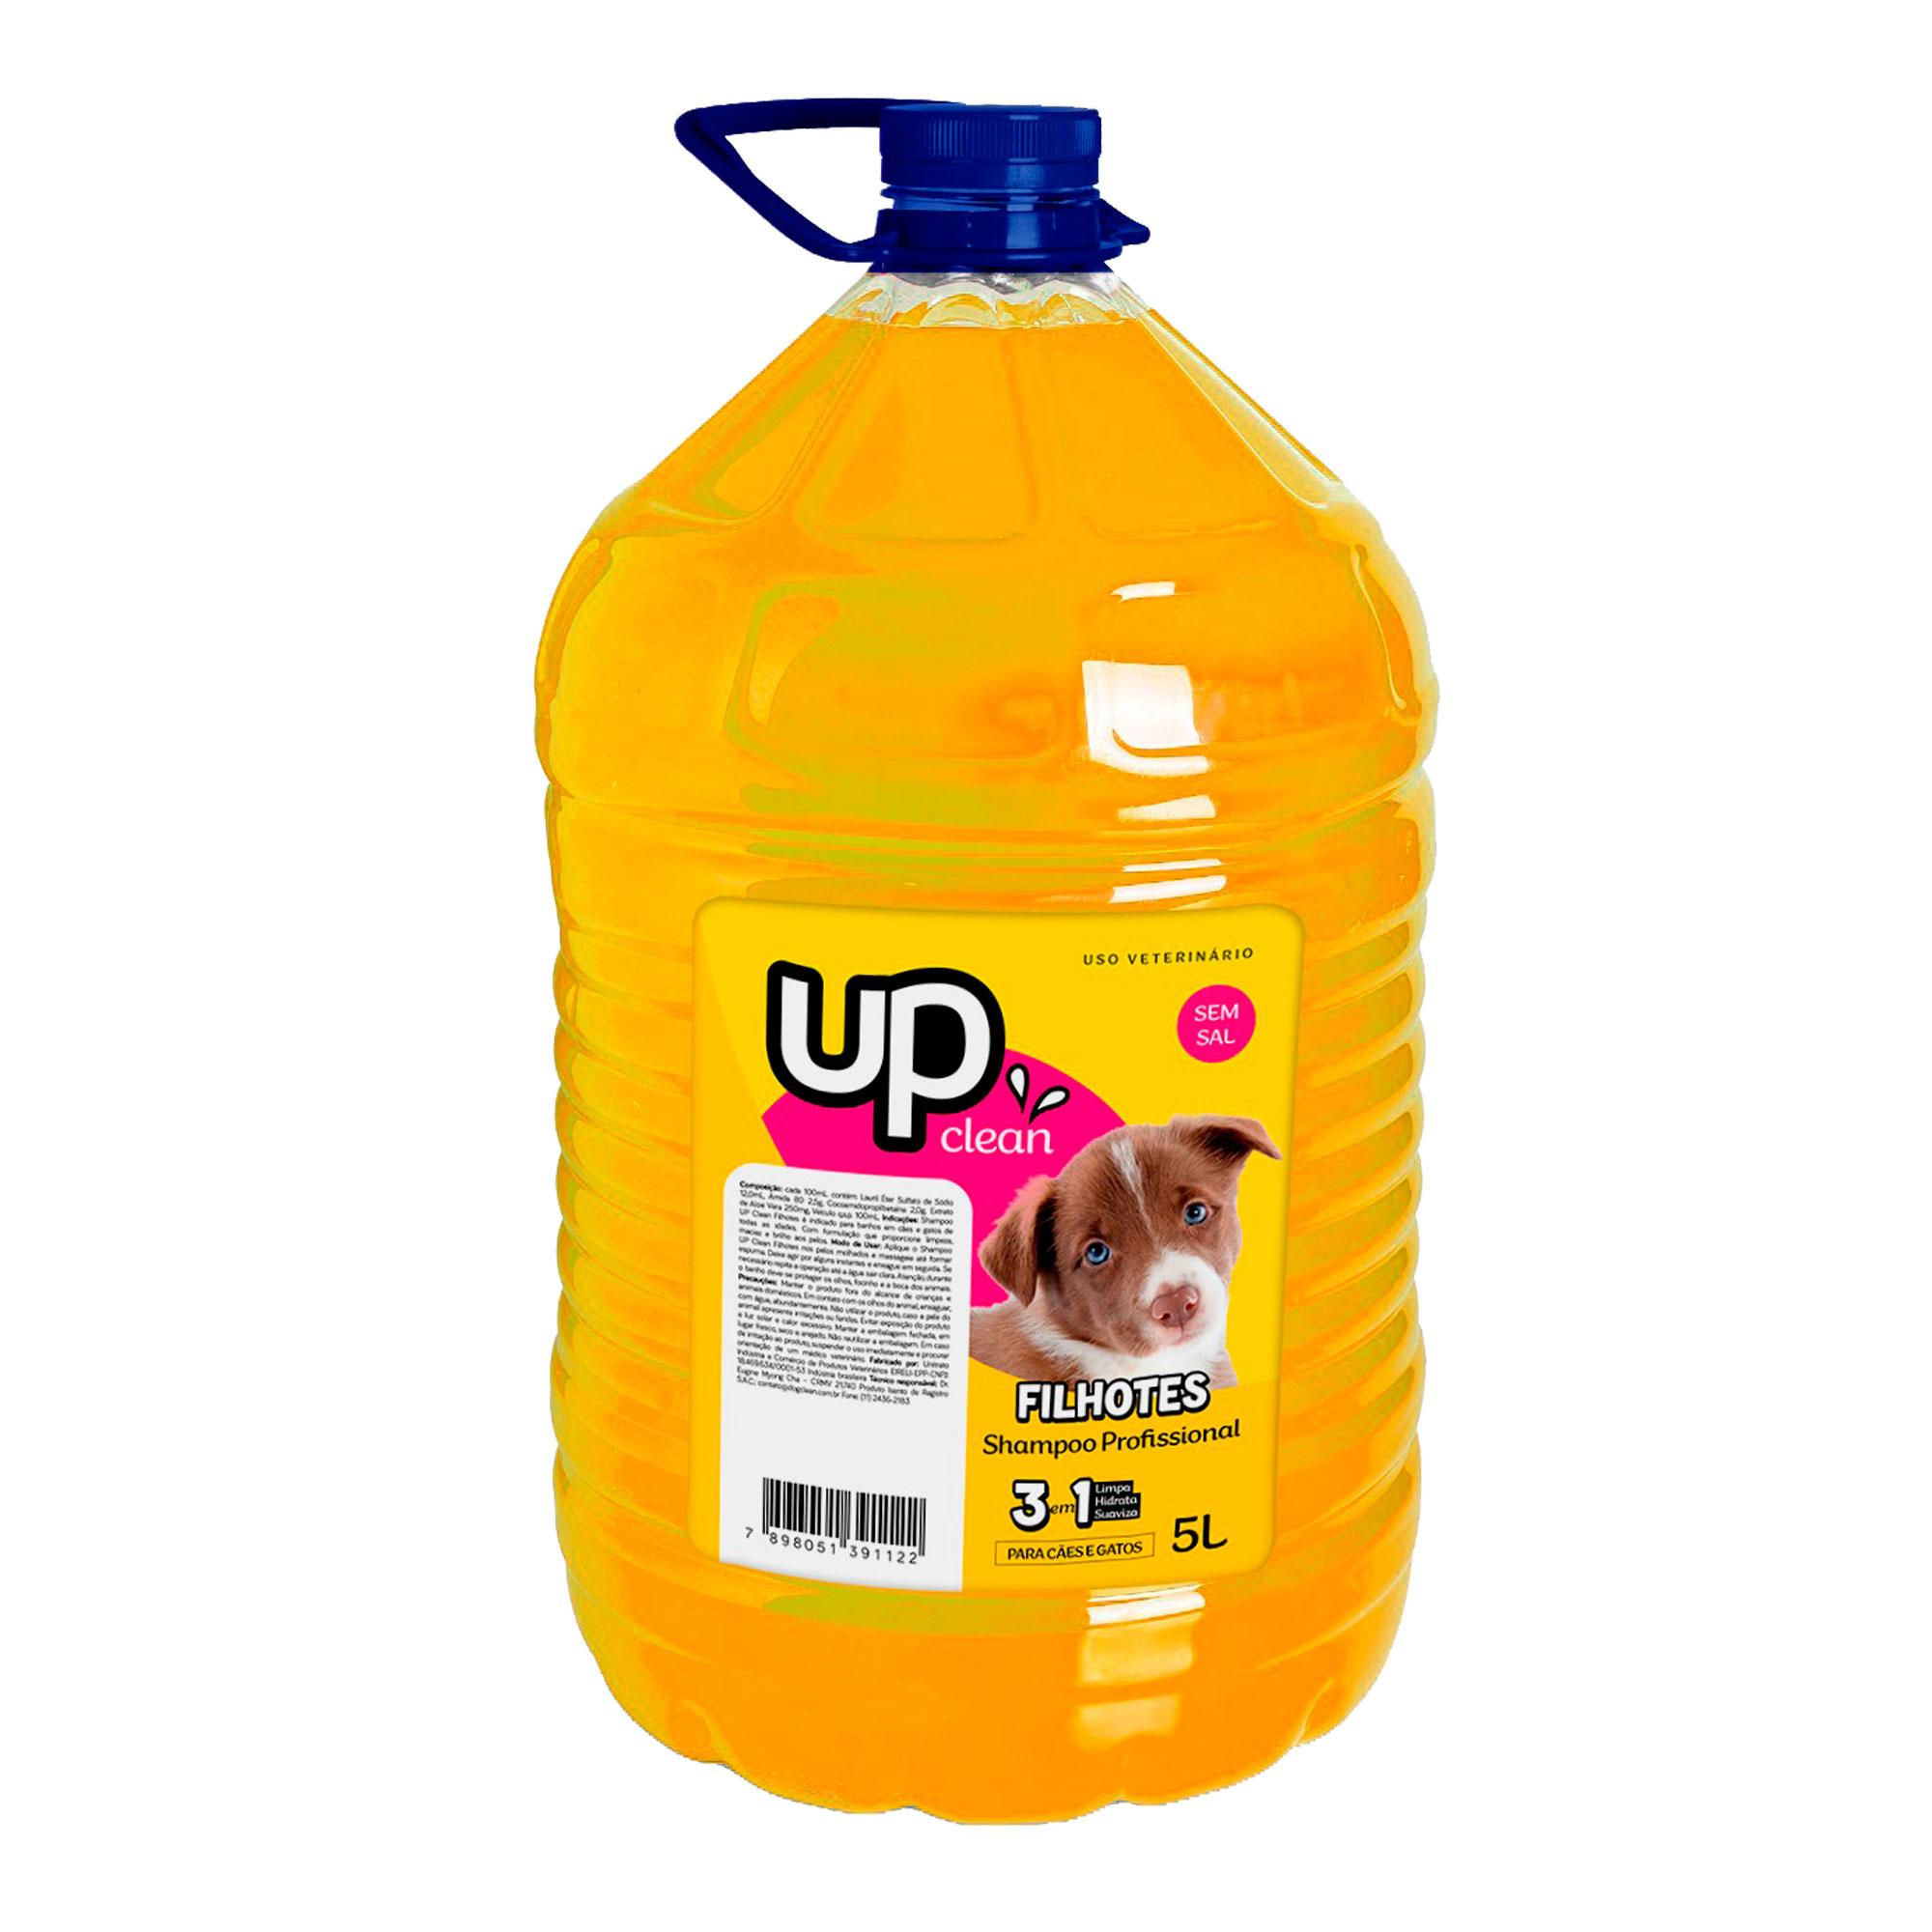 Shampoo Filhotes 5L Up Clean